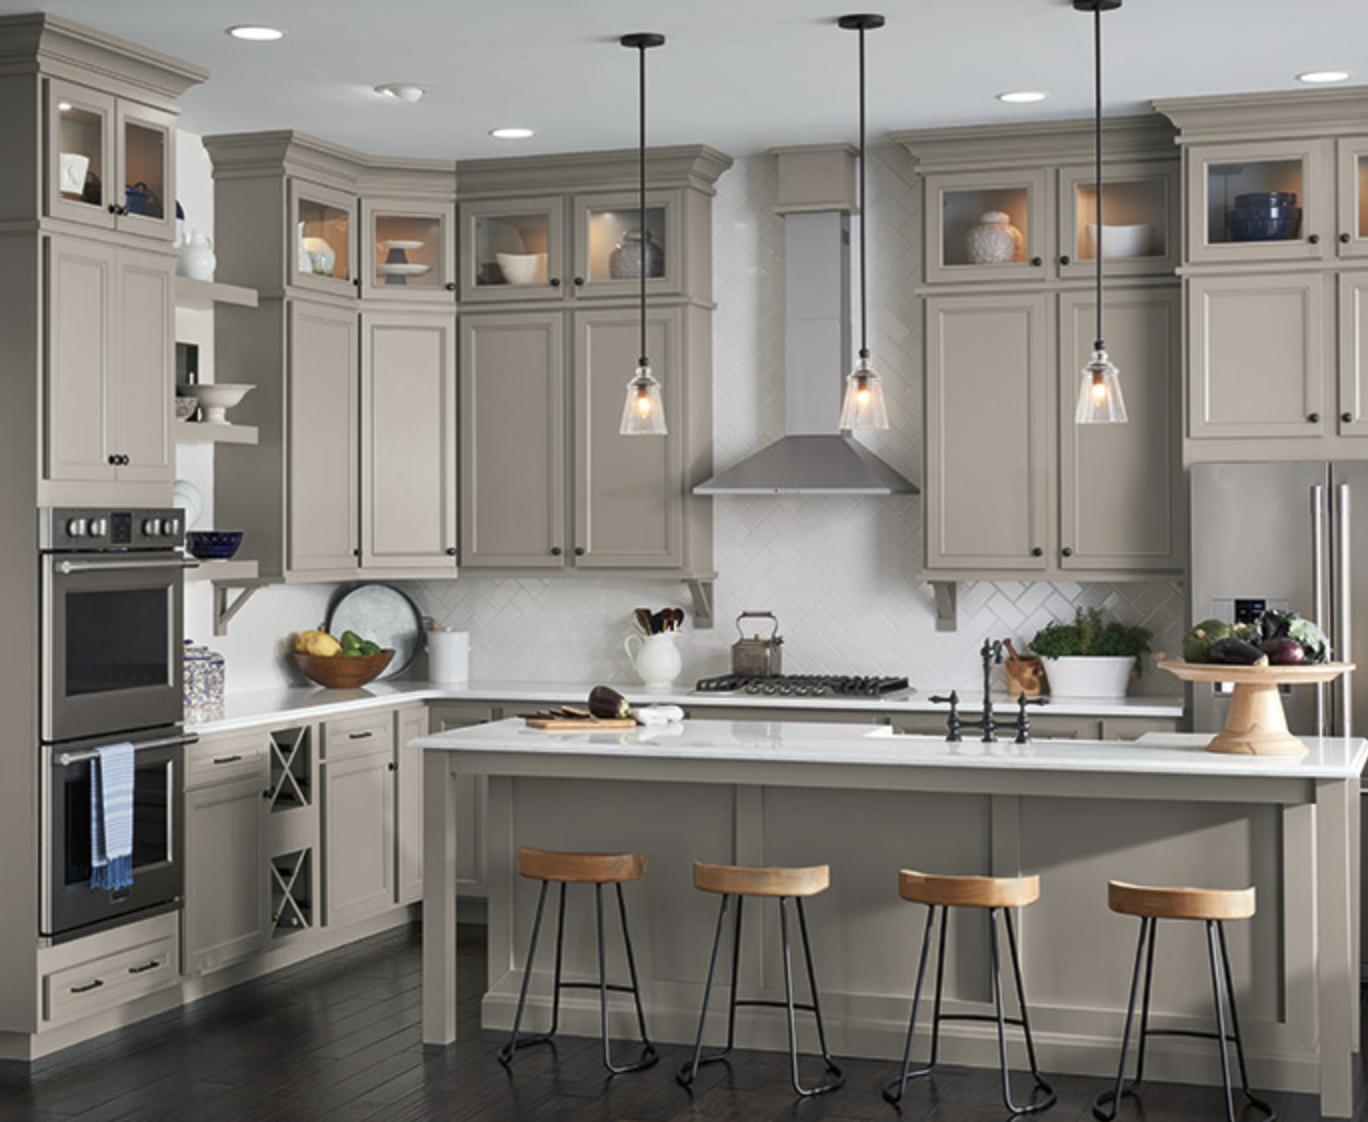 Aristokraft Cabinetry for kitchen redesign, Johnson Lumber, Maryland Kitchen Design